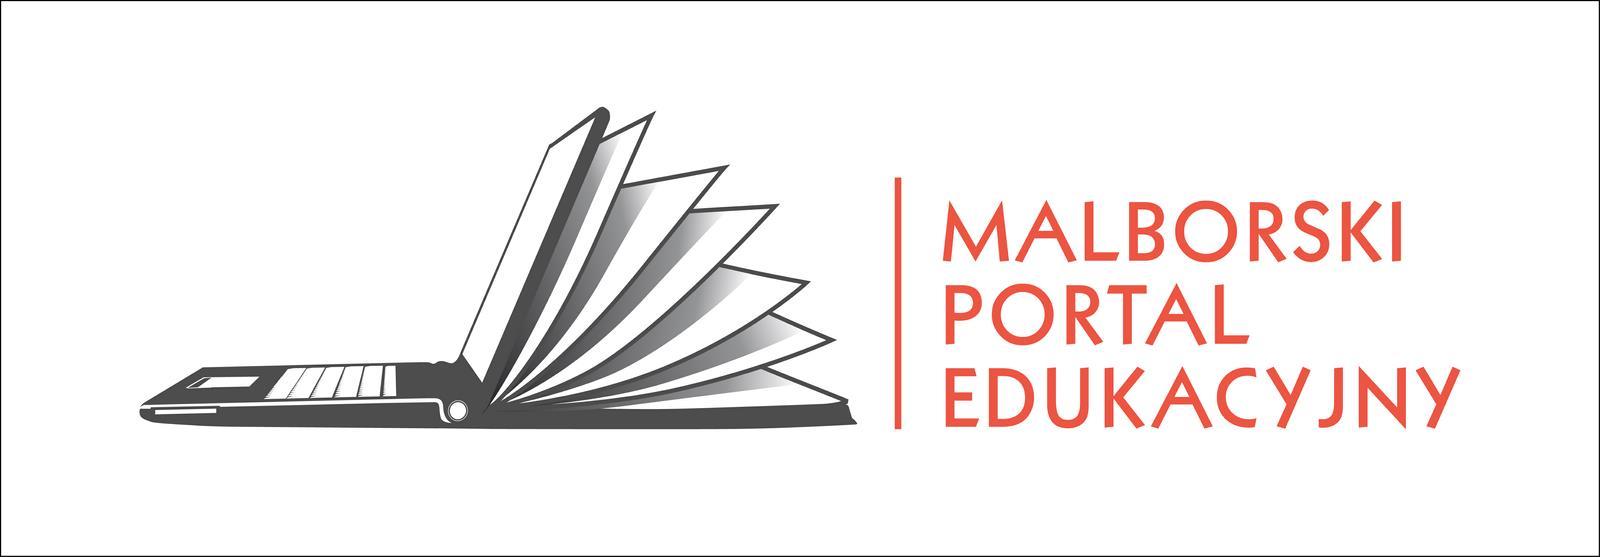 Malborski Portal Edukacyjny